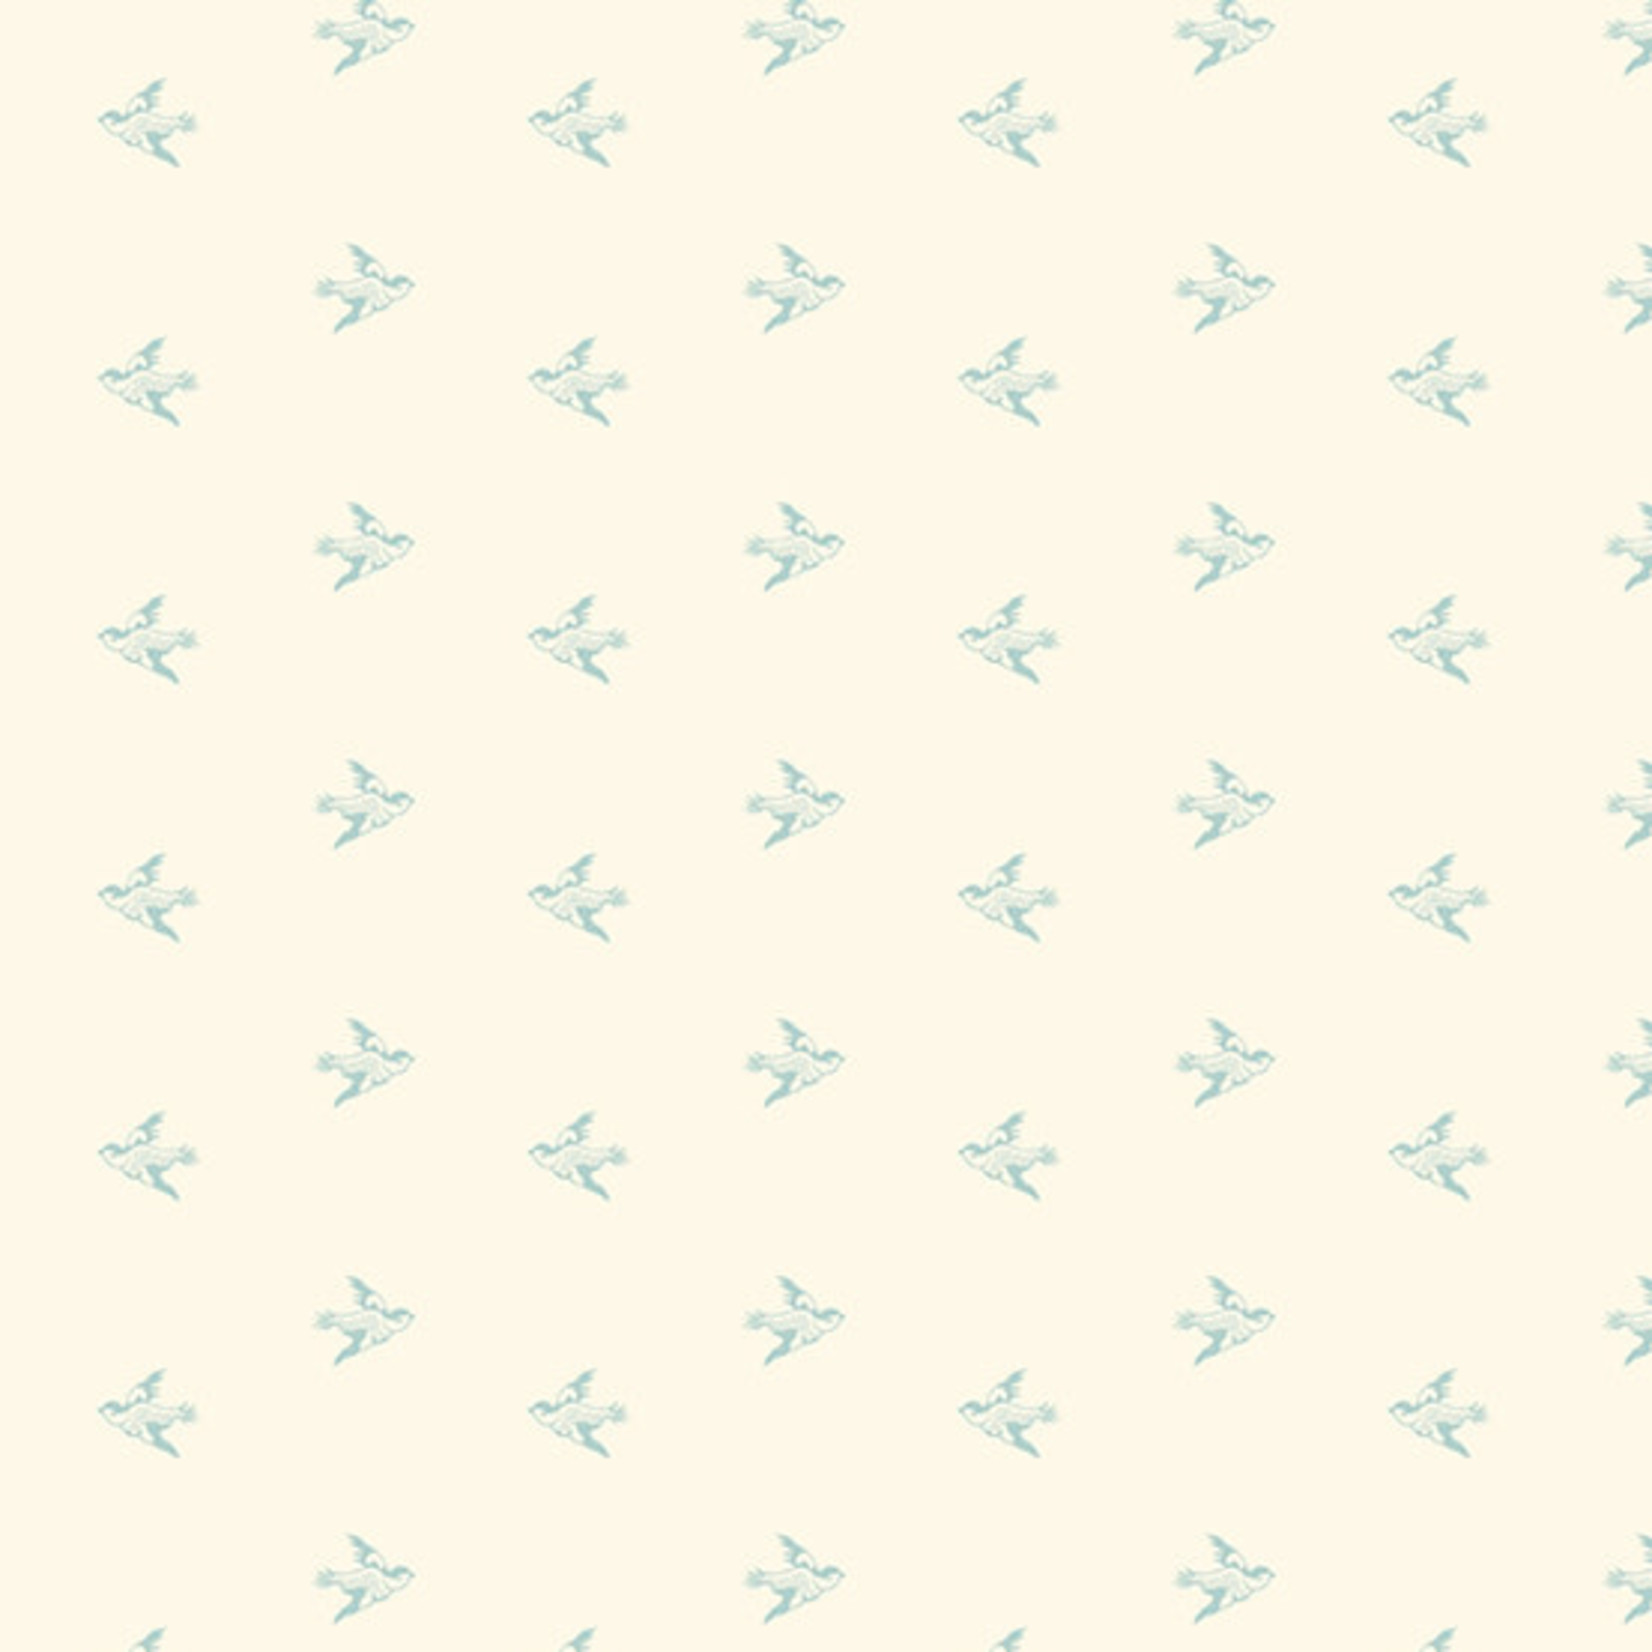 Edyta Sitar Secret Stash - Neutrals, Birds, Cream (9595-L $0.20 per cm or $20/m